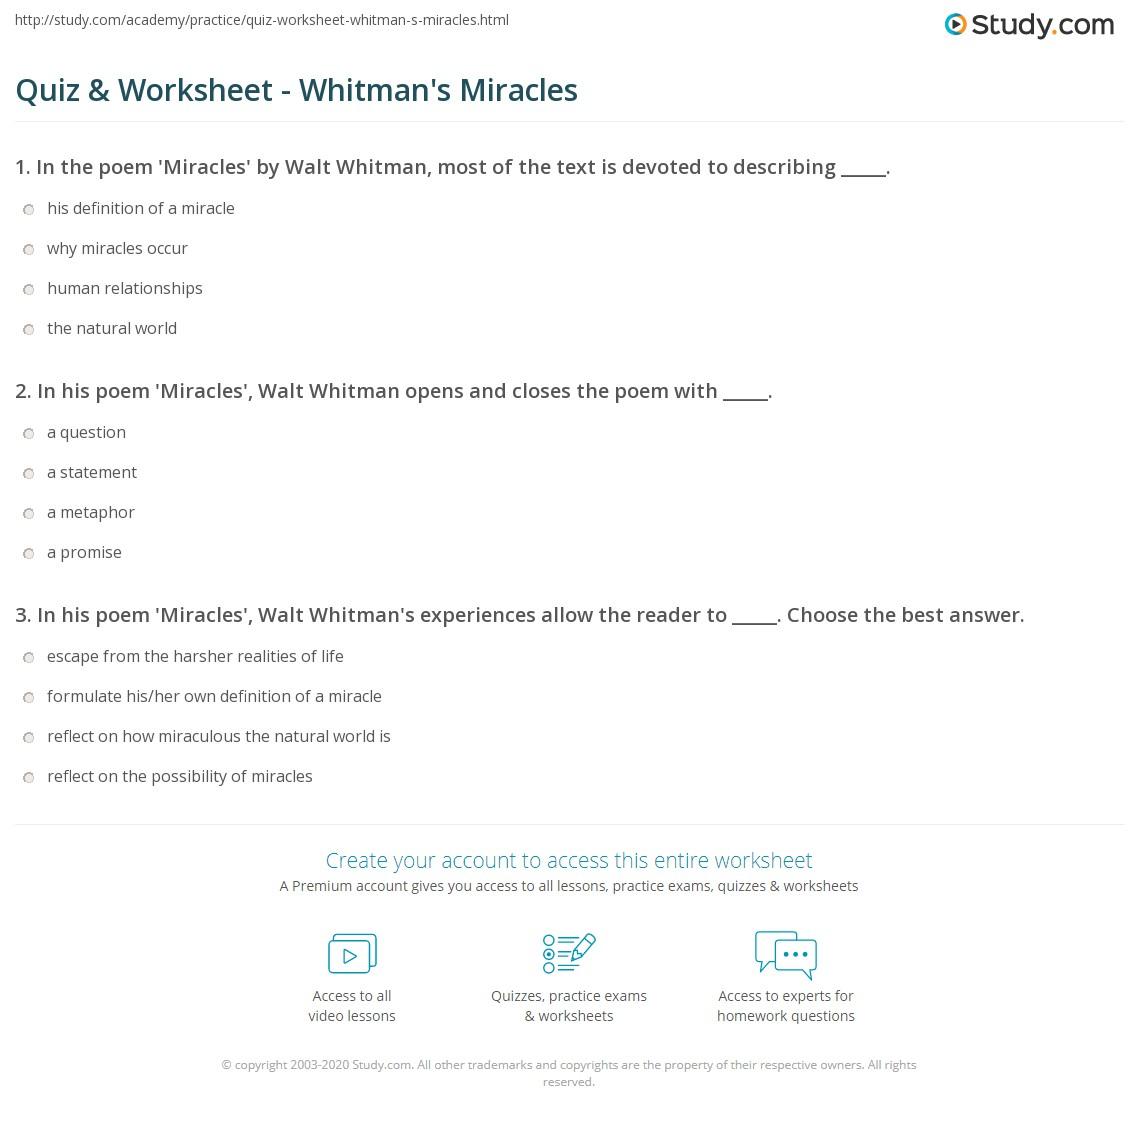 Quiz & Worksheet - Whitman's Miracles | Study com